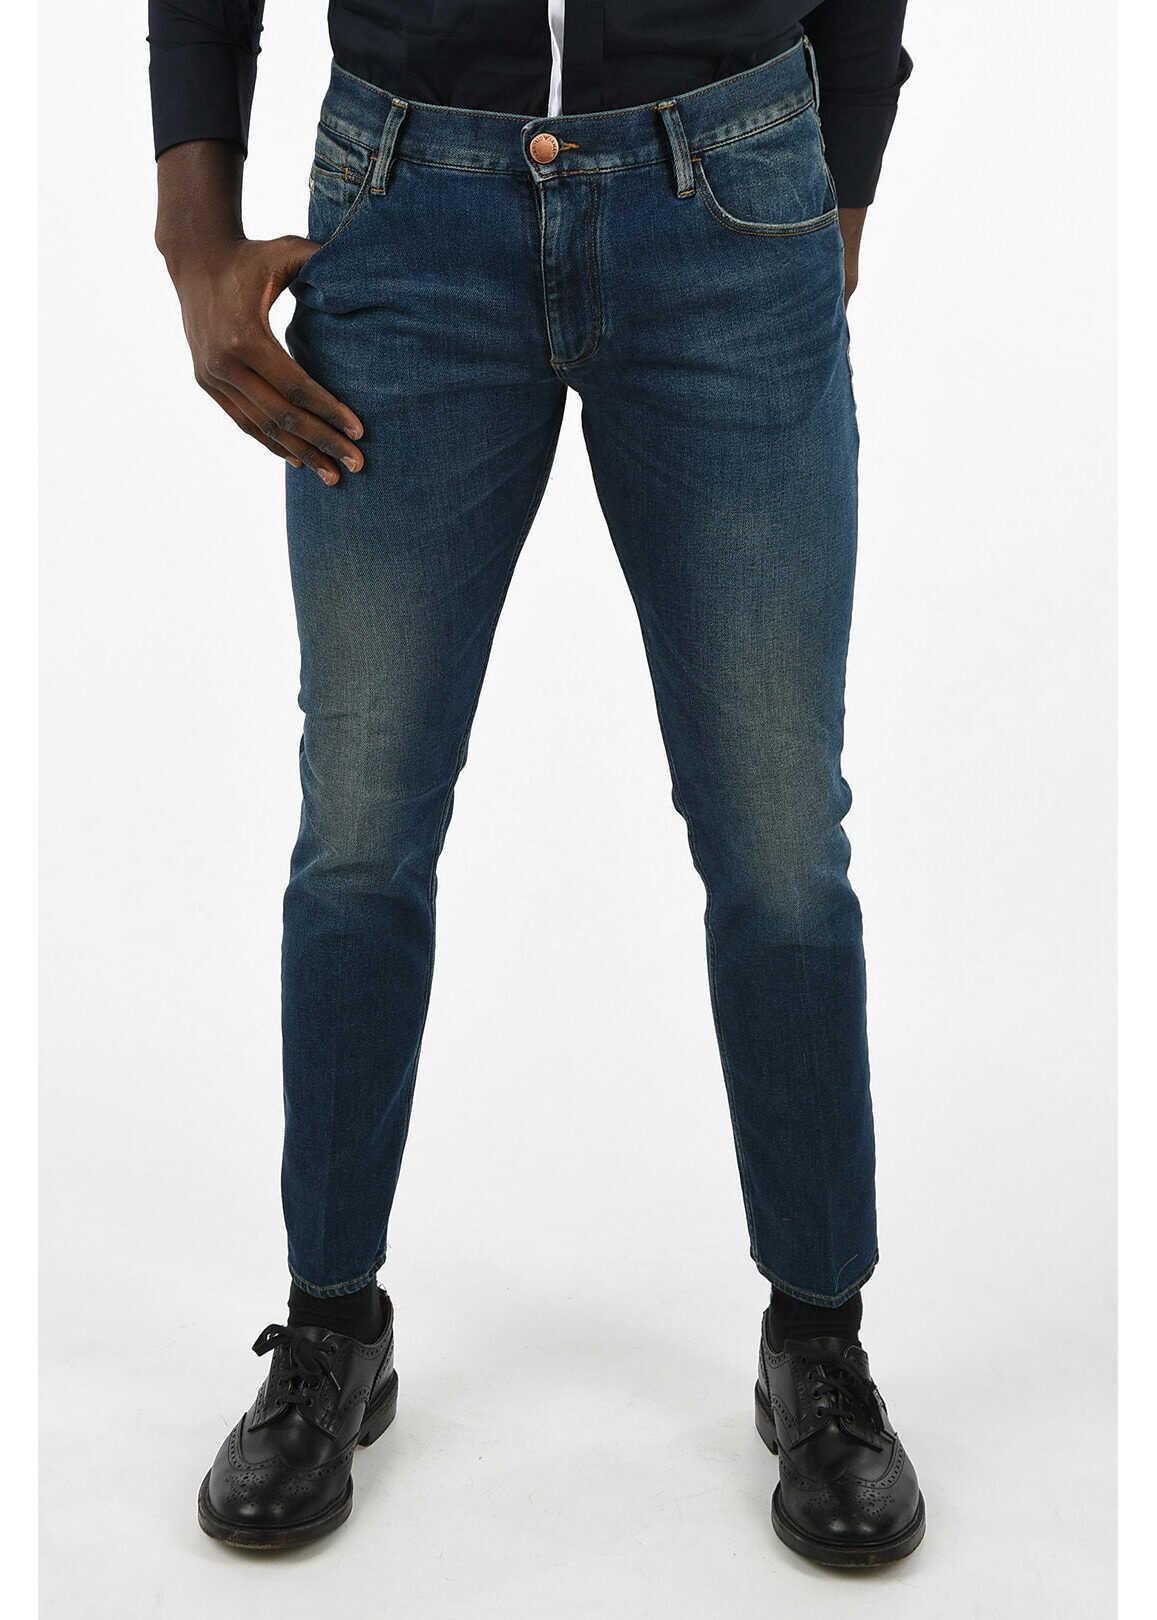 Armani EMPORIO 18 cm Slim Fit Jeans* BLUE